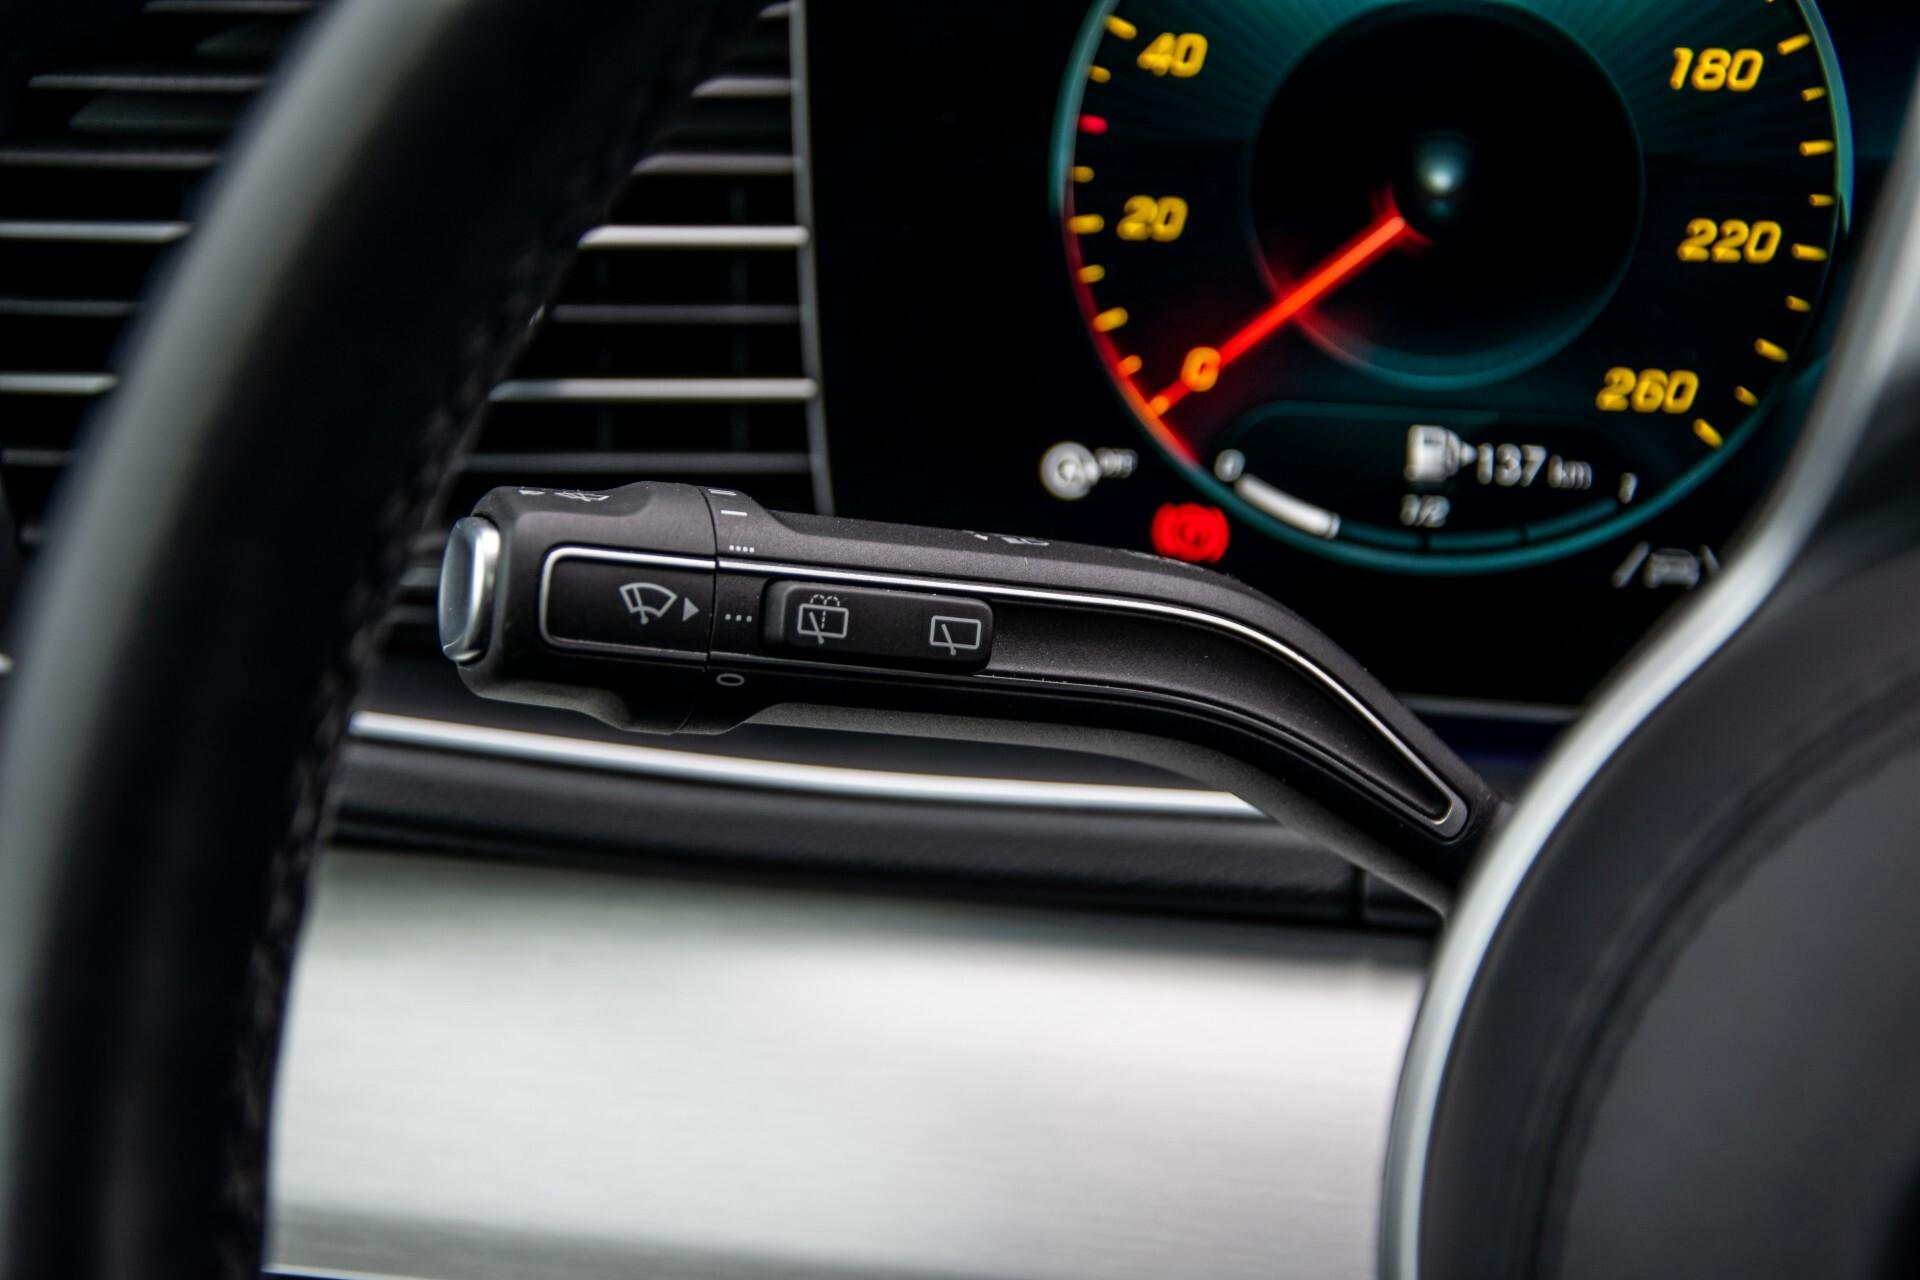 Mercedes-Benz GLE 450 4-M 7-Persoons AMG Massage/Rij-assist/Keyless/TV/360/Night/Trekhaak Aut9 Foto 12